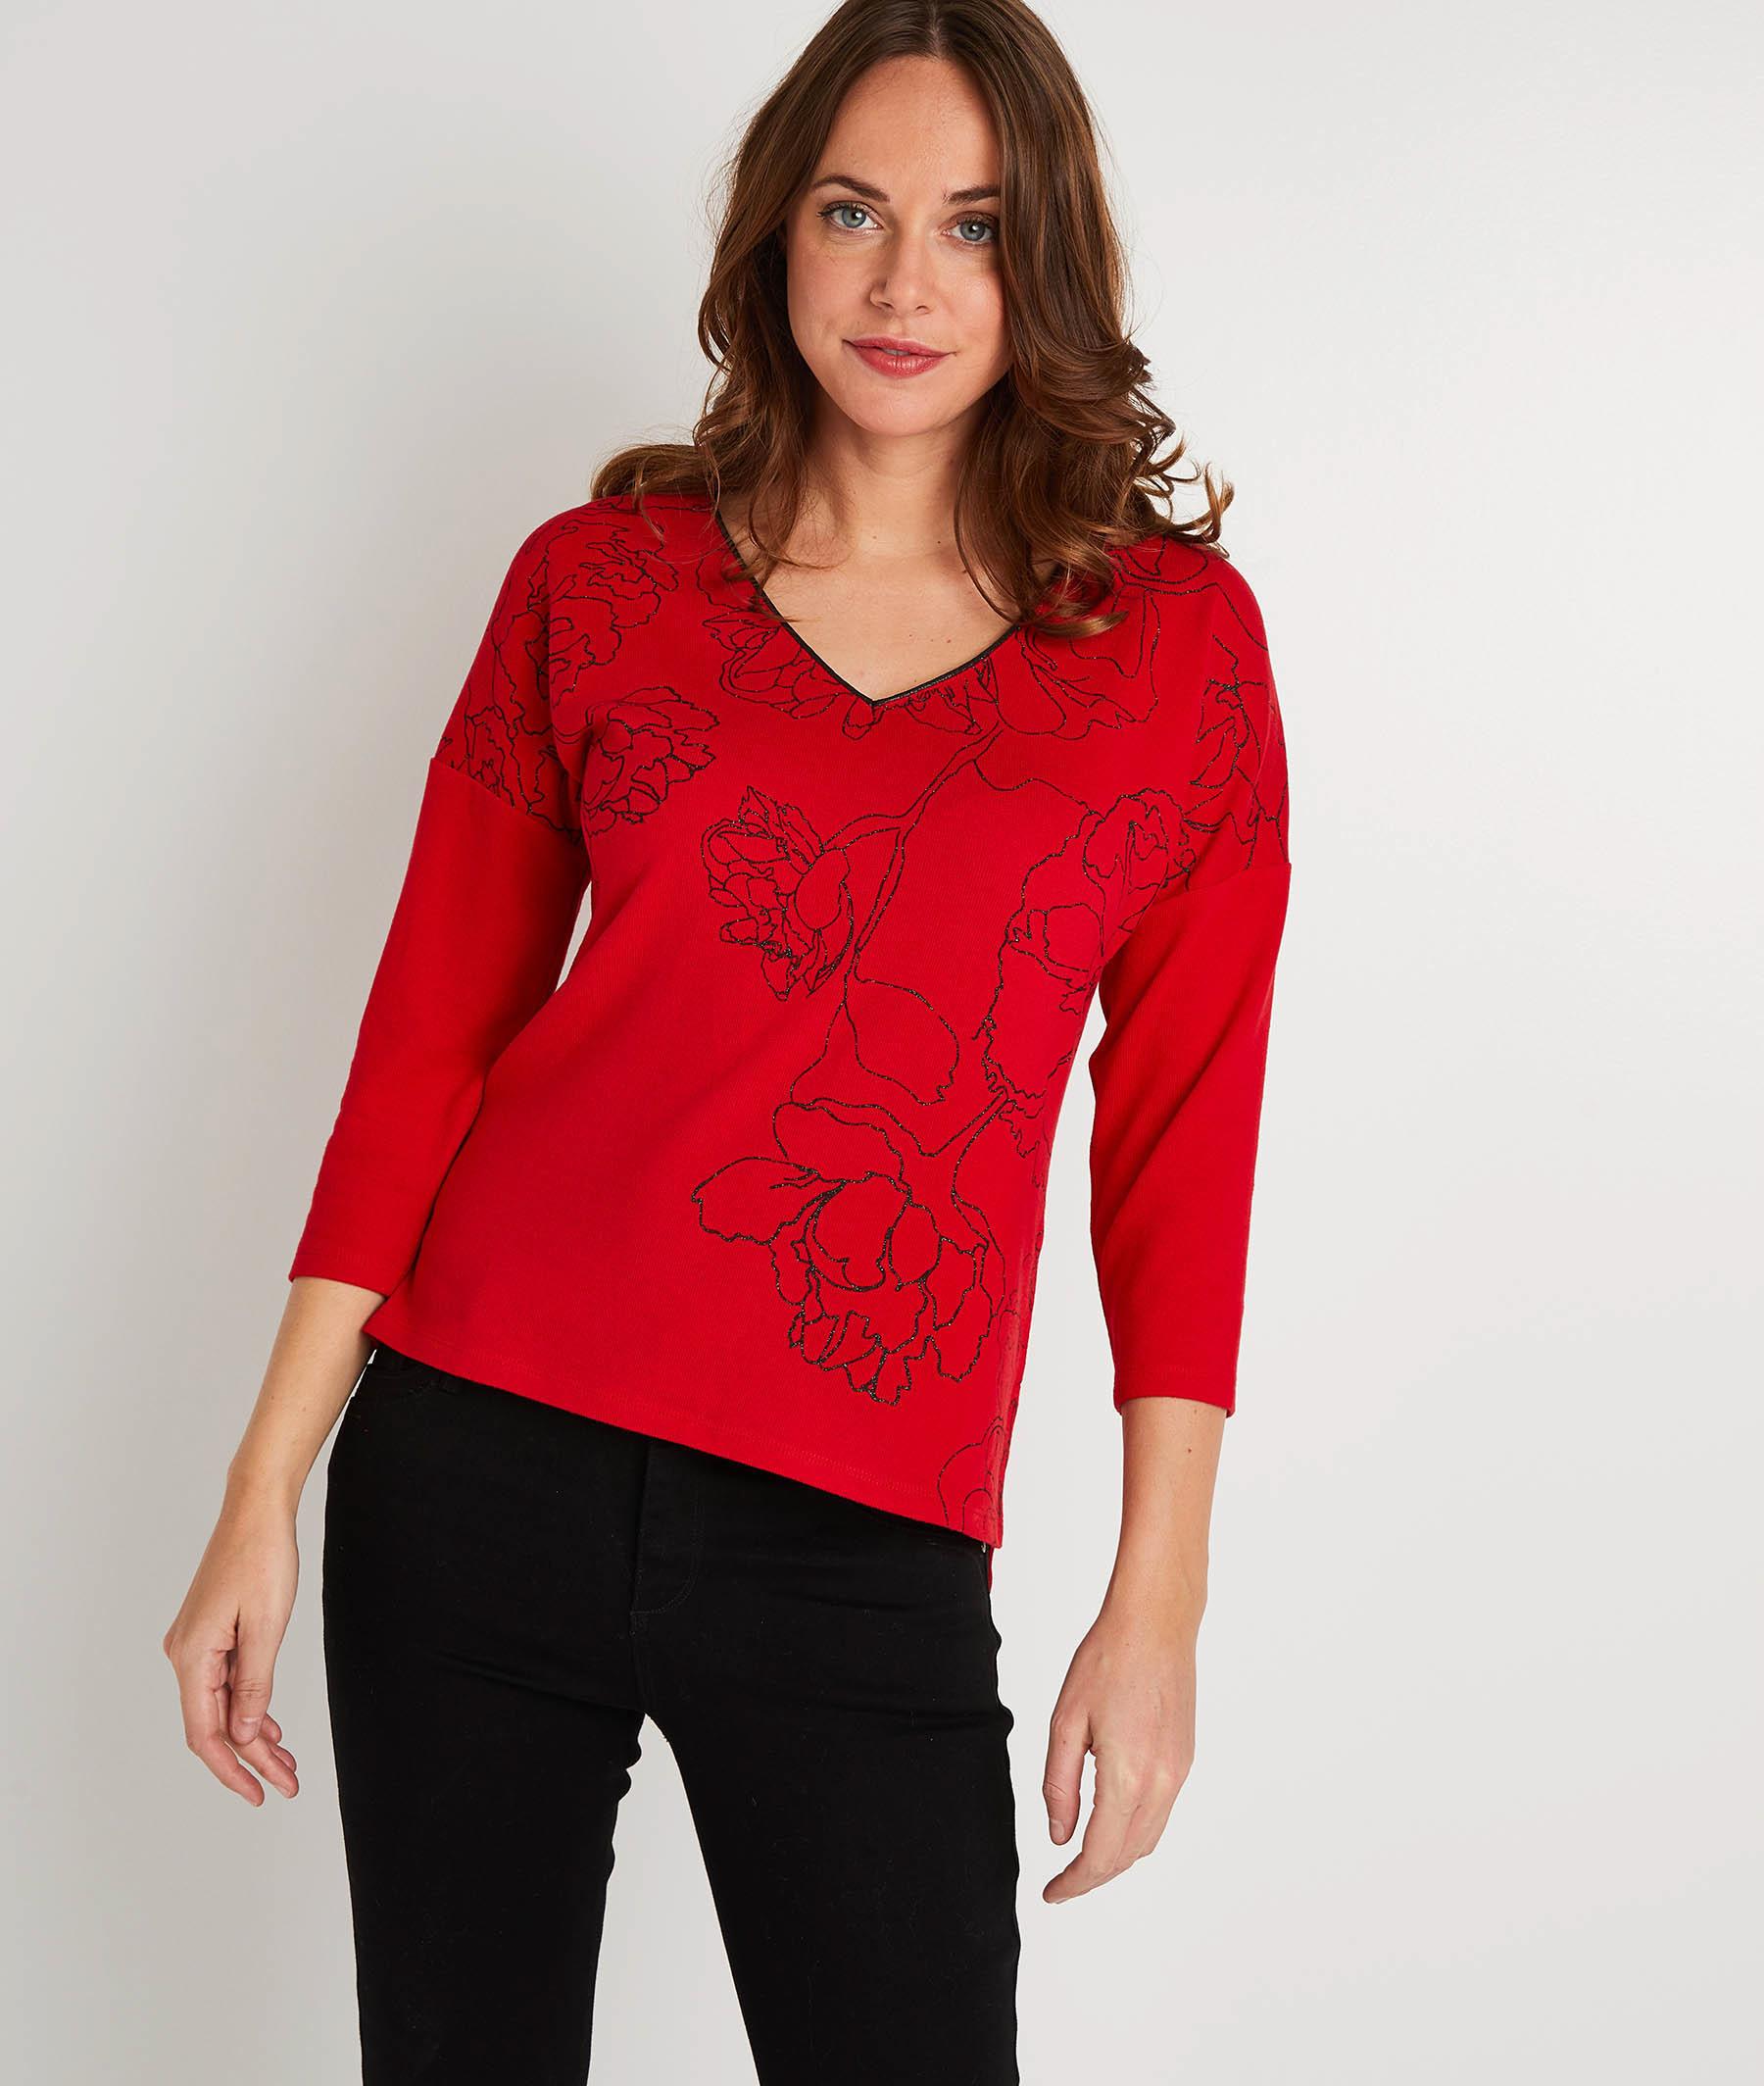 T-shirt rouge fleuri femme ROUGE